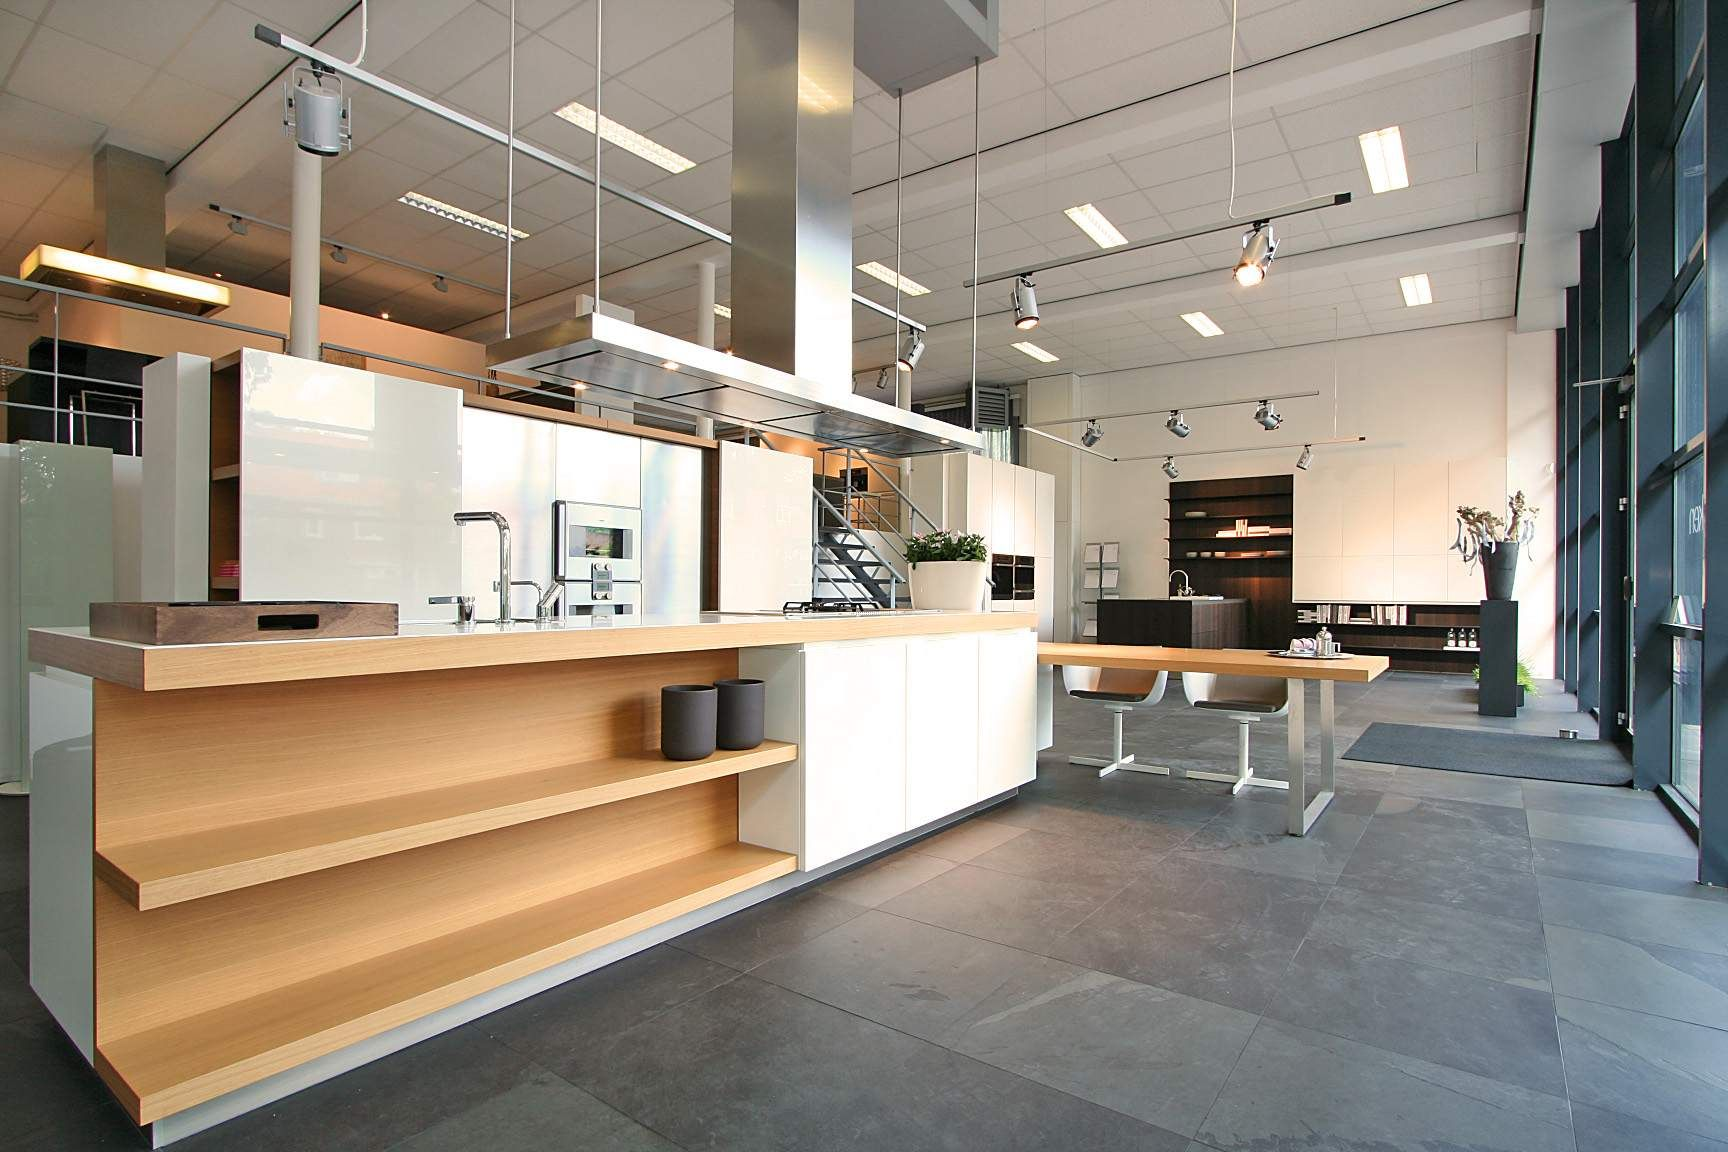 Eiland Keuken Aanbieding : Showroomkorting nl De voordeligste woonwinkel van